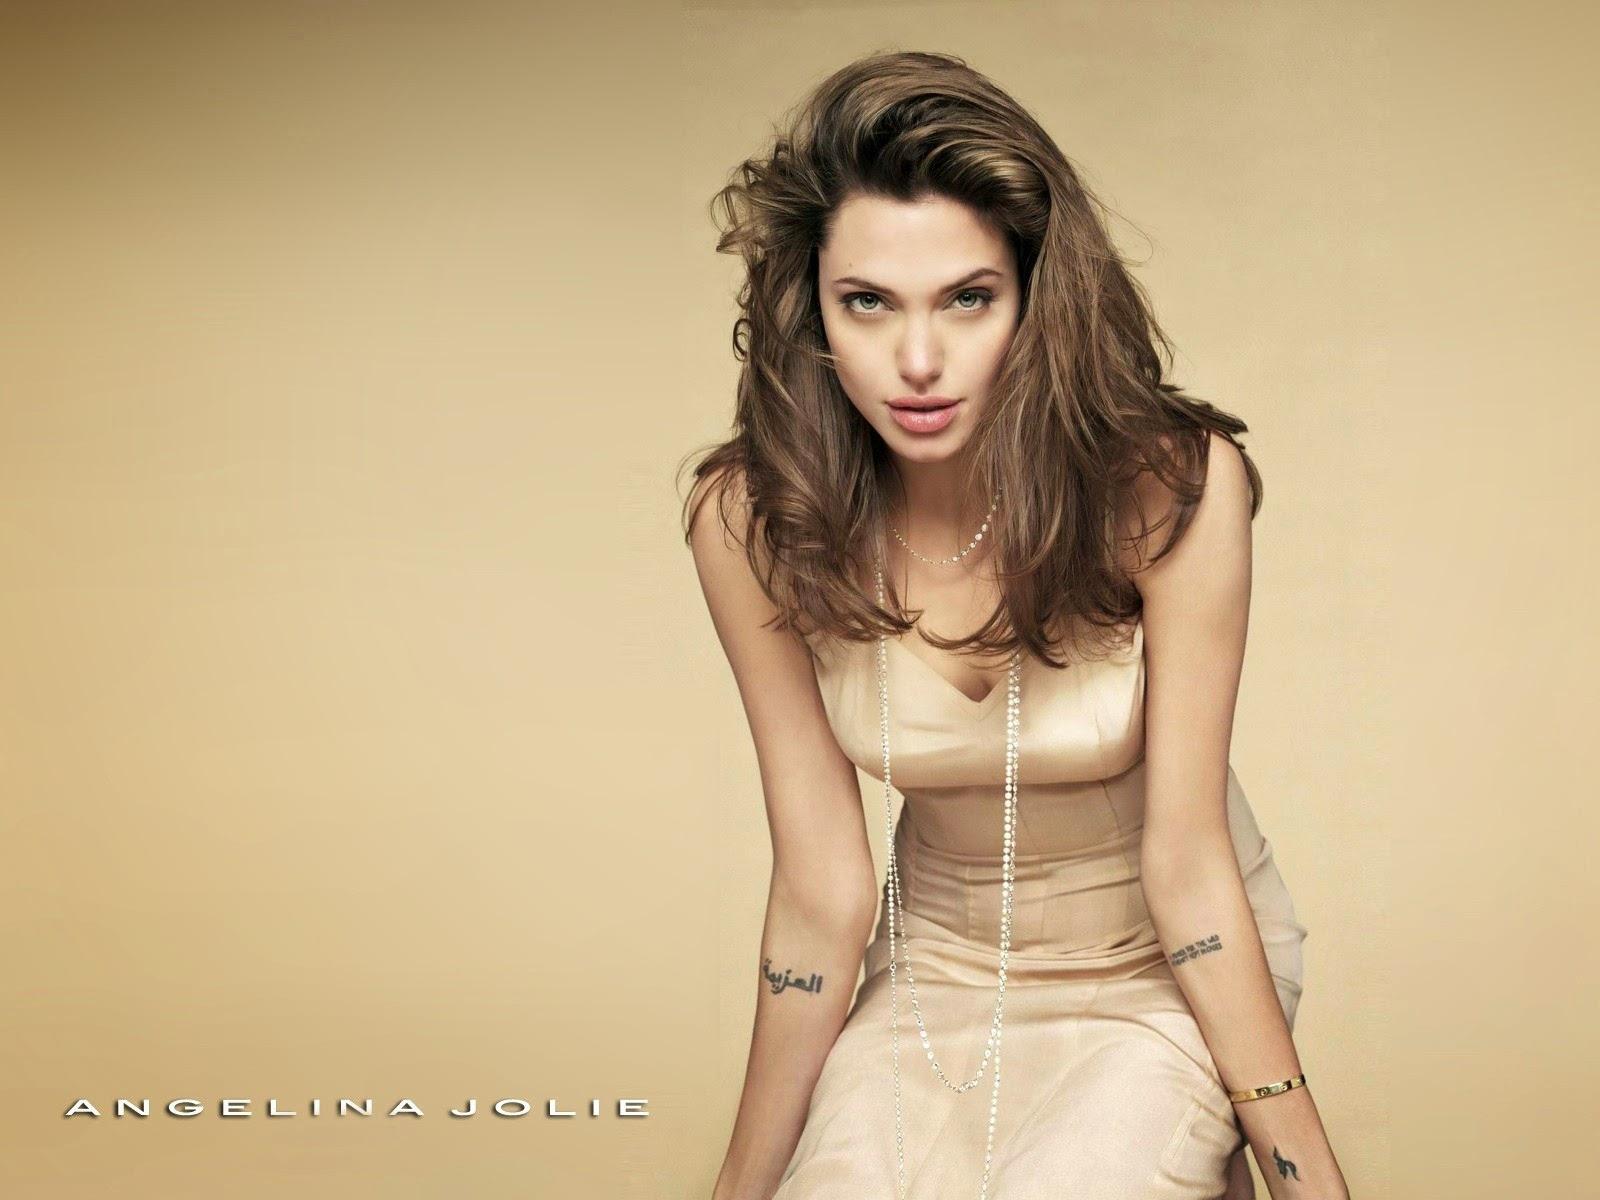 Film Stars World: Angelina Jolie HD Wallpaper 1080p